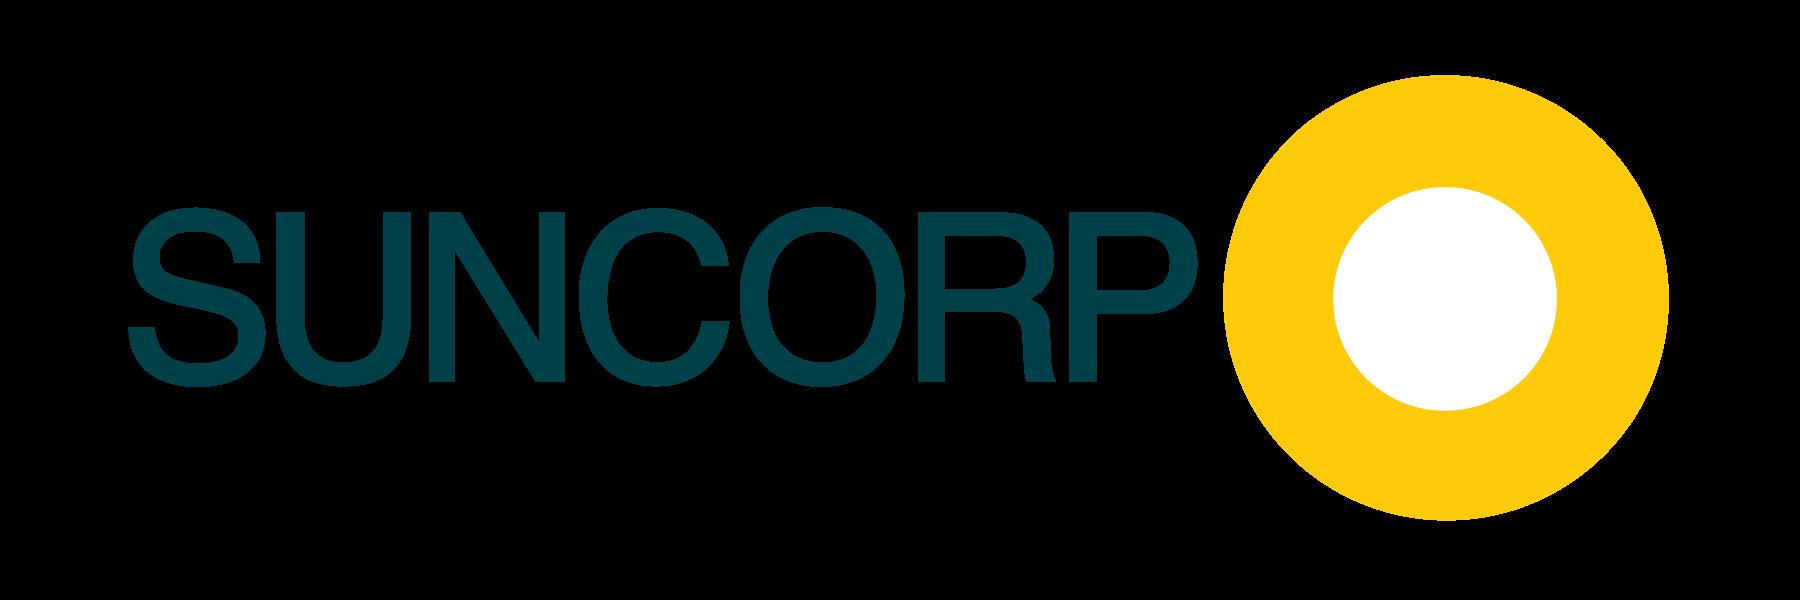 Suncorp_Bank_logo.png